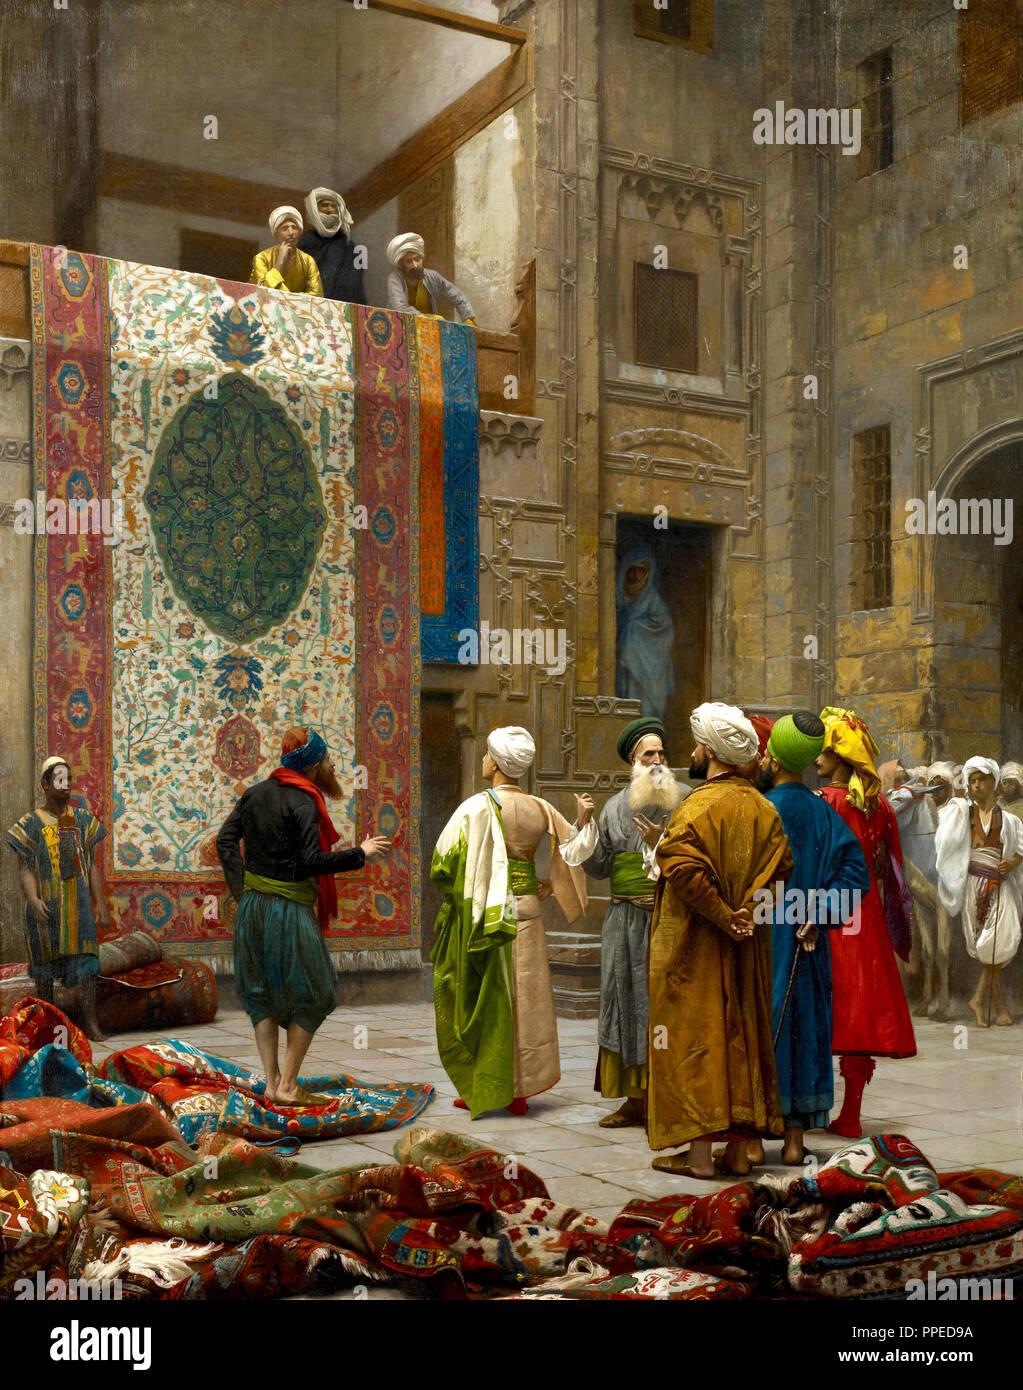 Jean-Leon Gerome, The Carpet Merchant / Carpet Merchant in Cairo. Circa 1887. Oil on canvas. Minneapolis Institute of Art, USA. - Stock Image